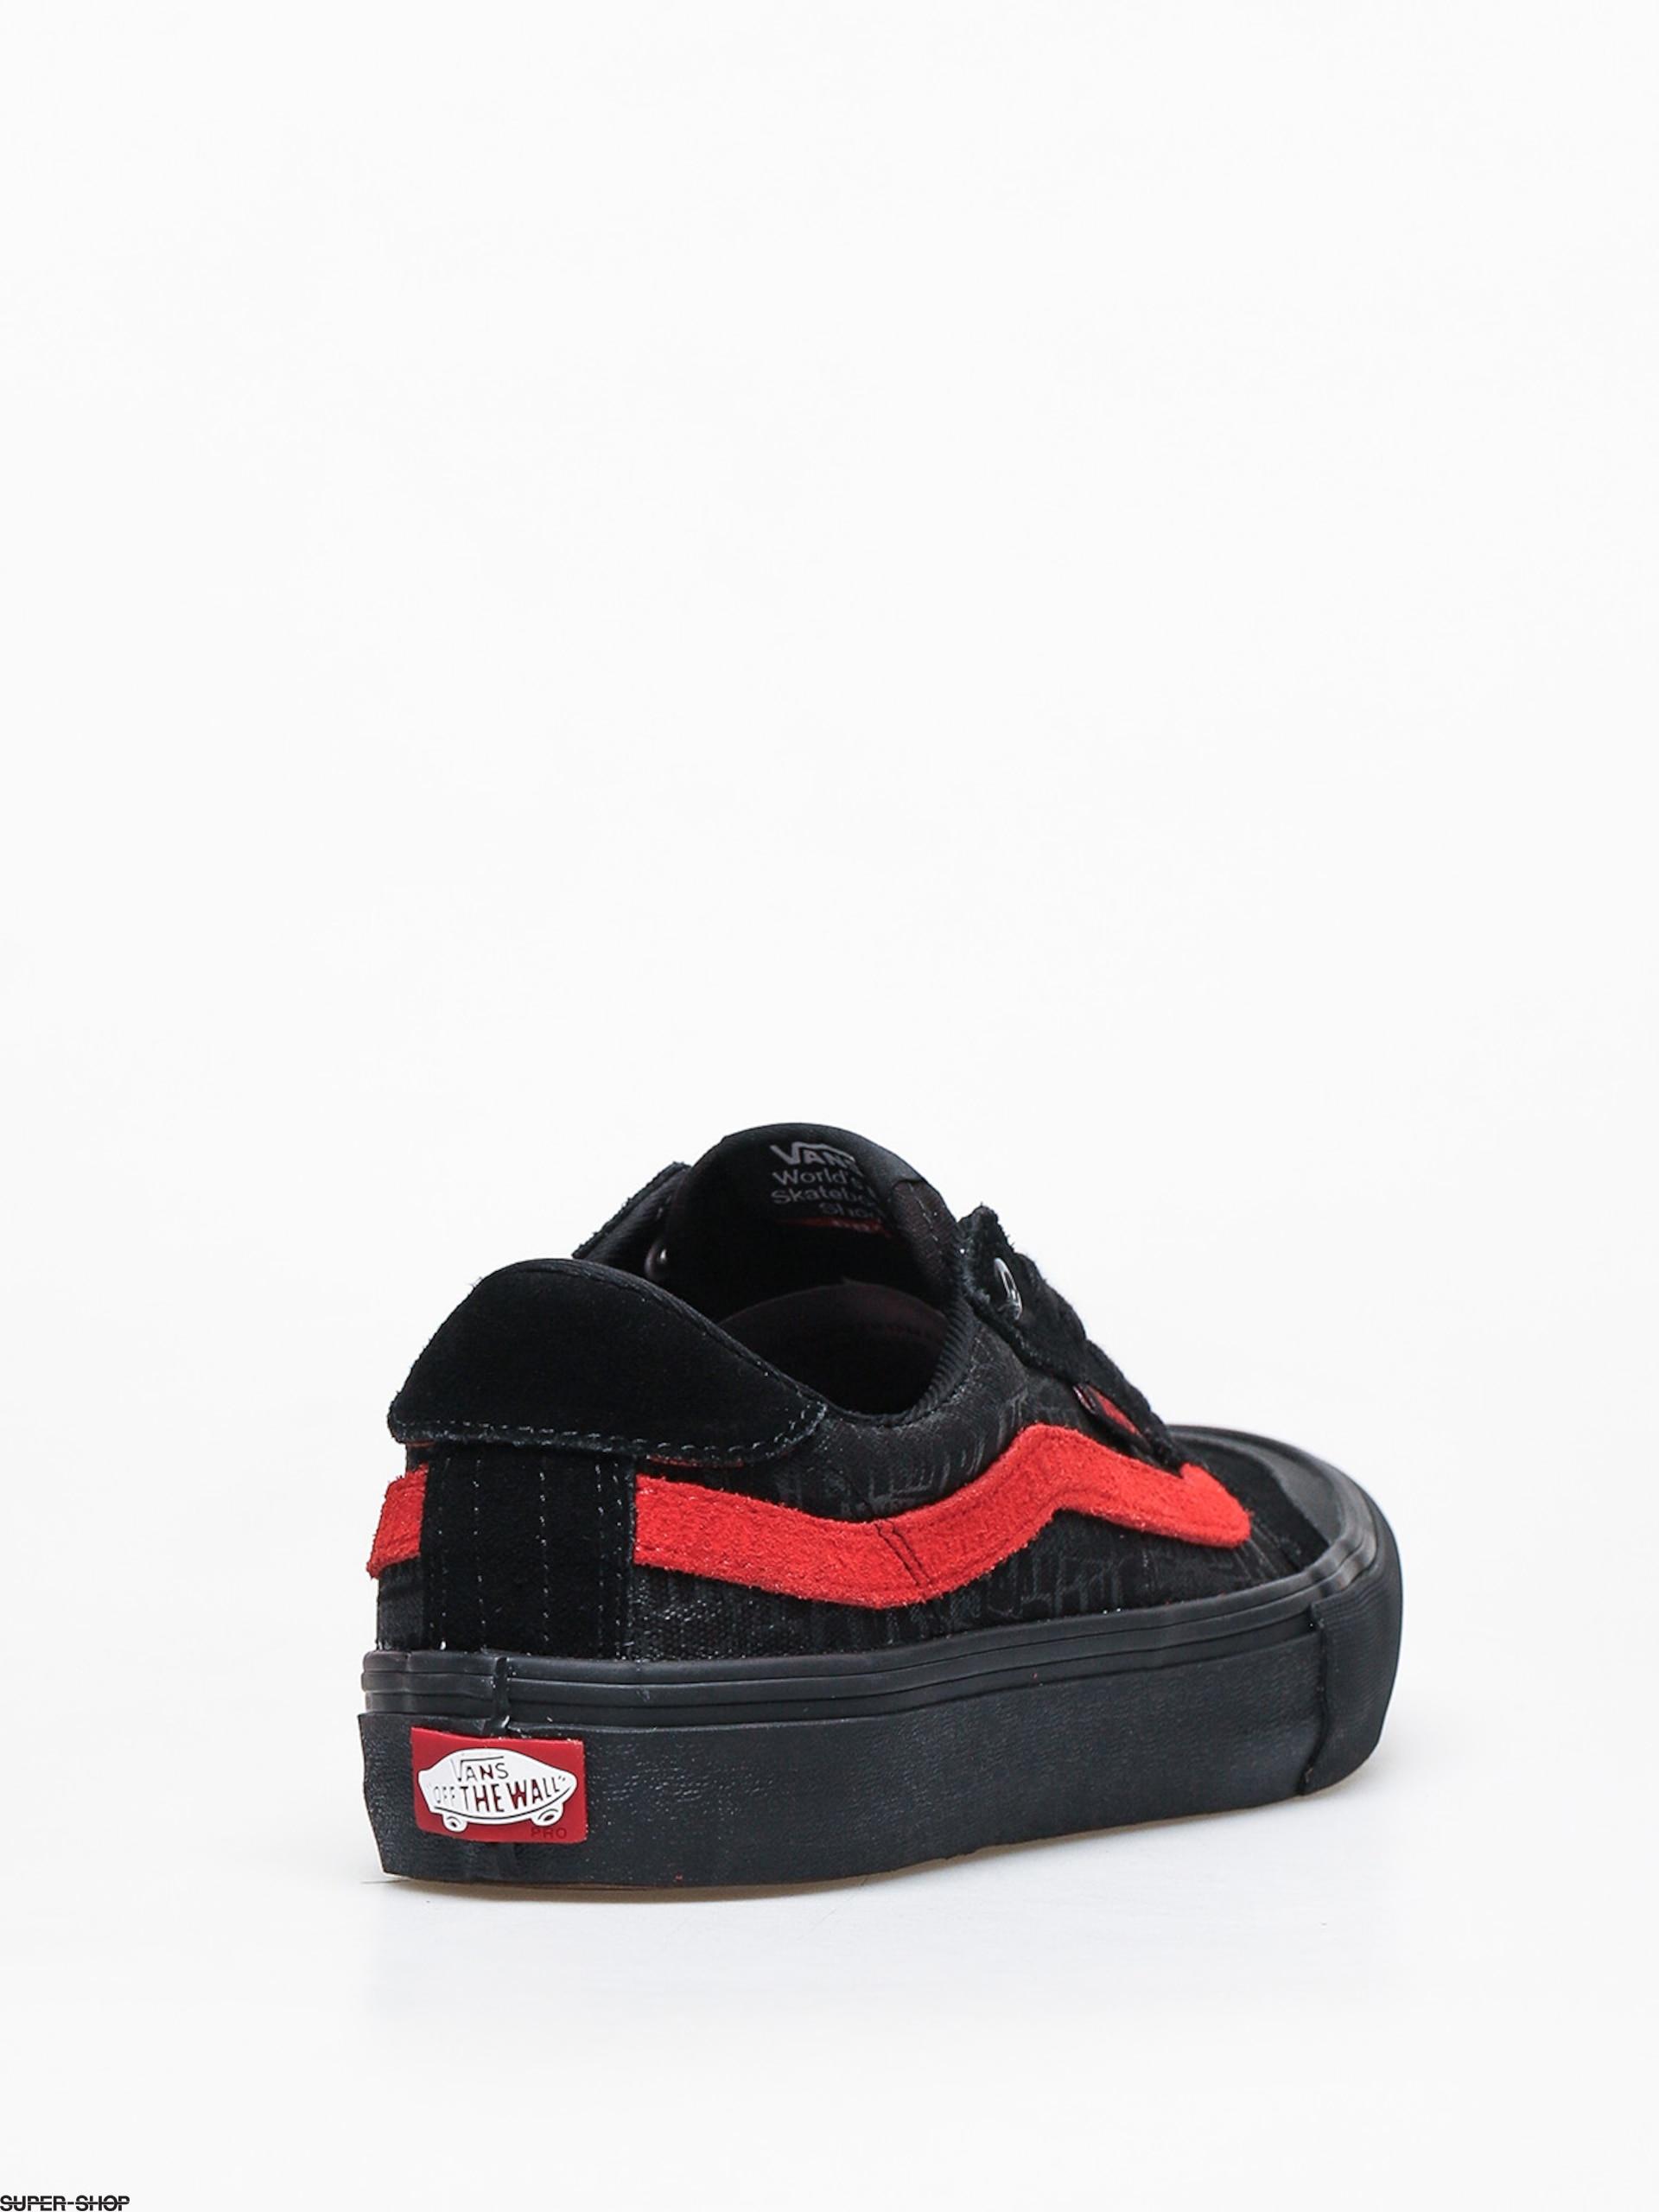 Vans Style 112 Pro Shoes (black/black/red)